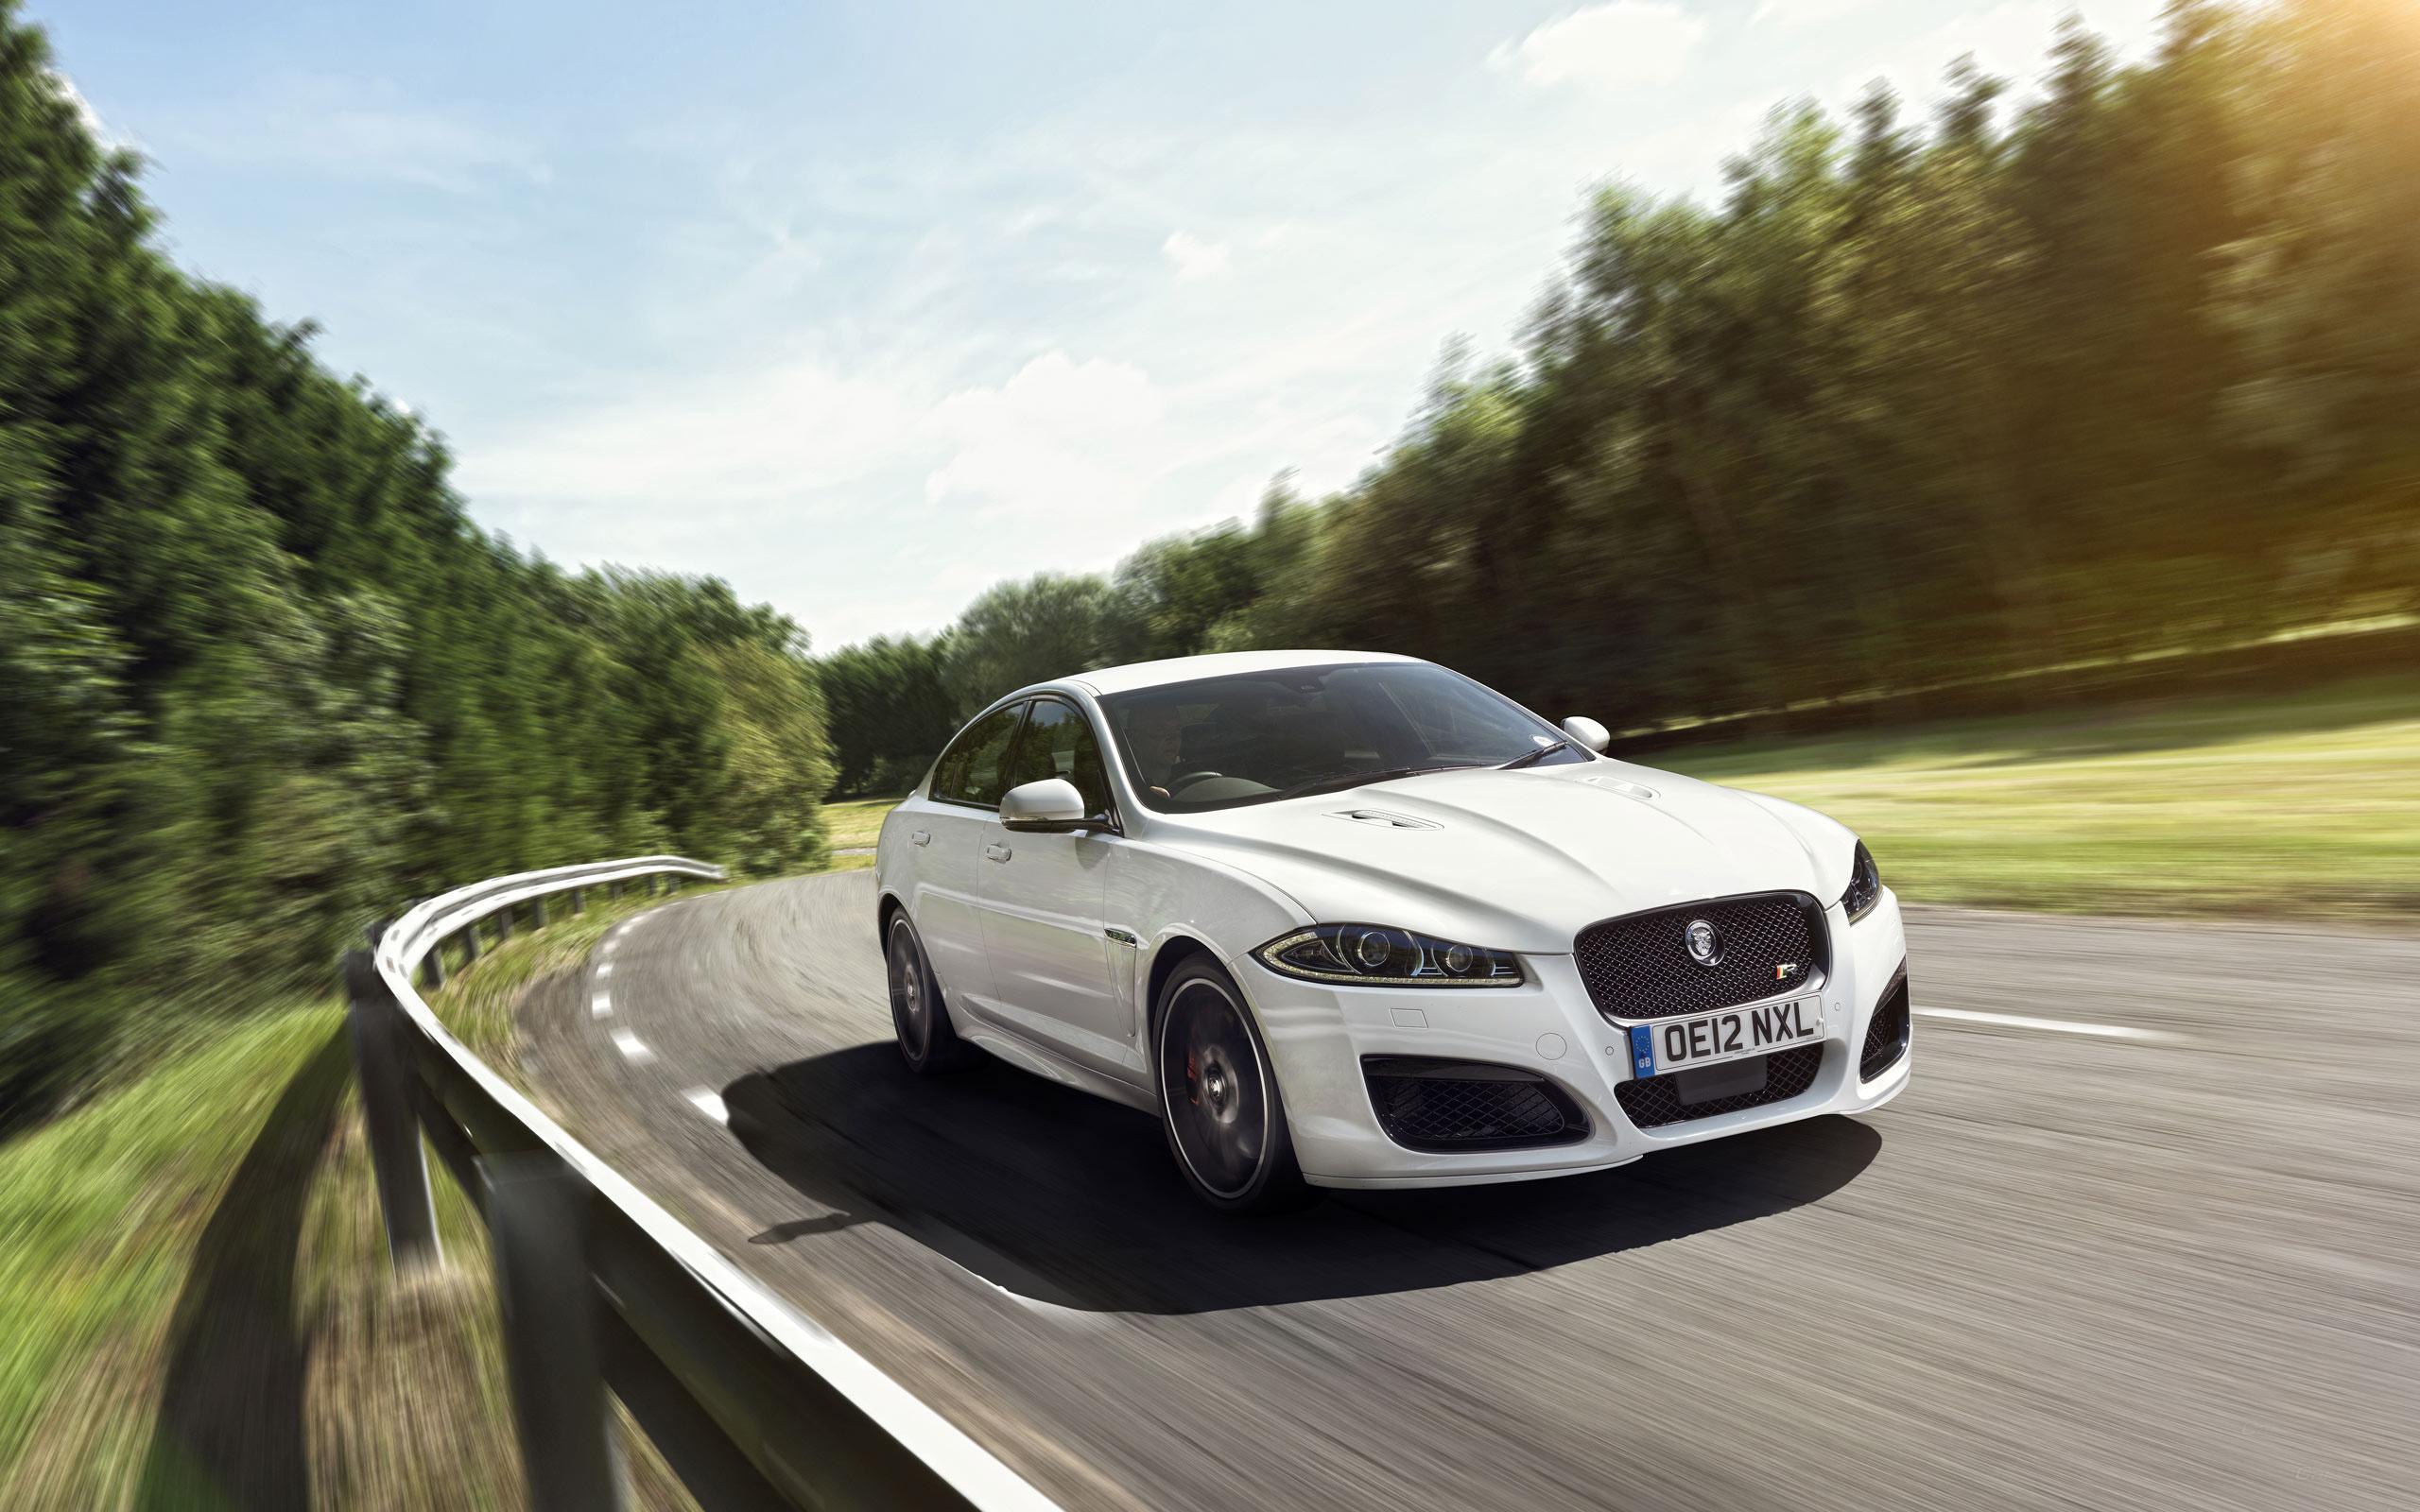 2013 Jaguar Xfr Widescreen Car Hd Wallpaper My Site